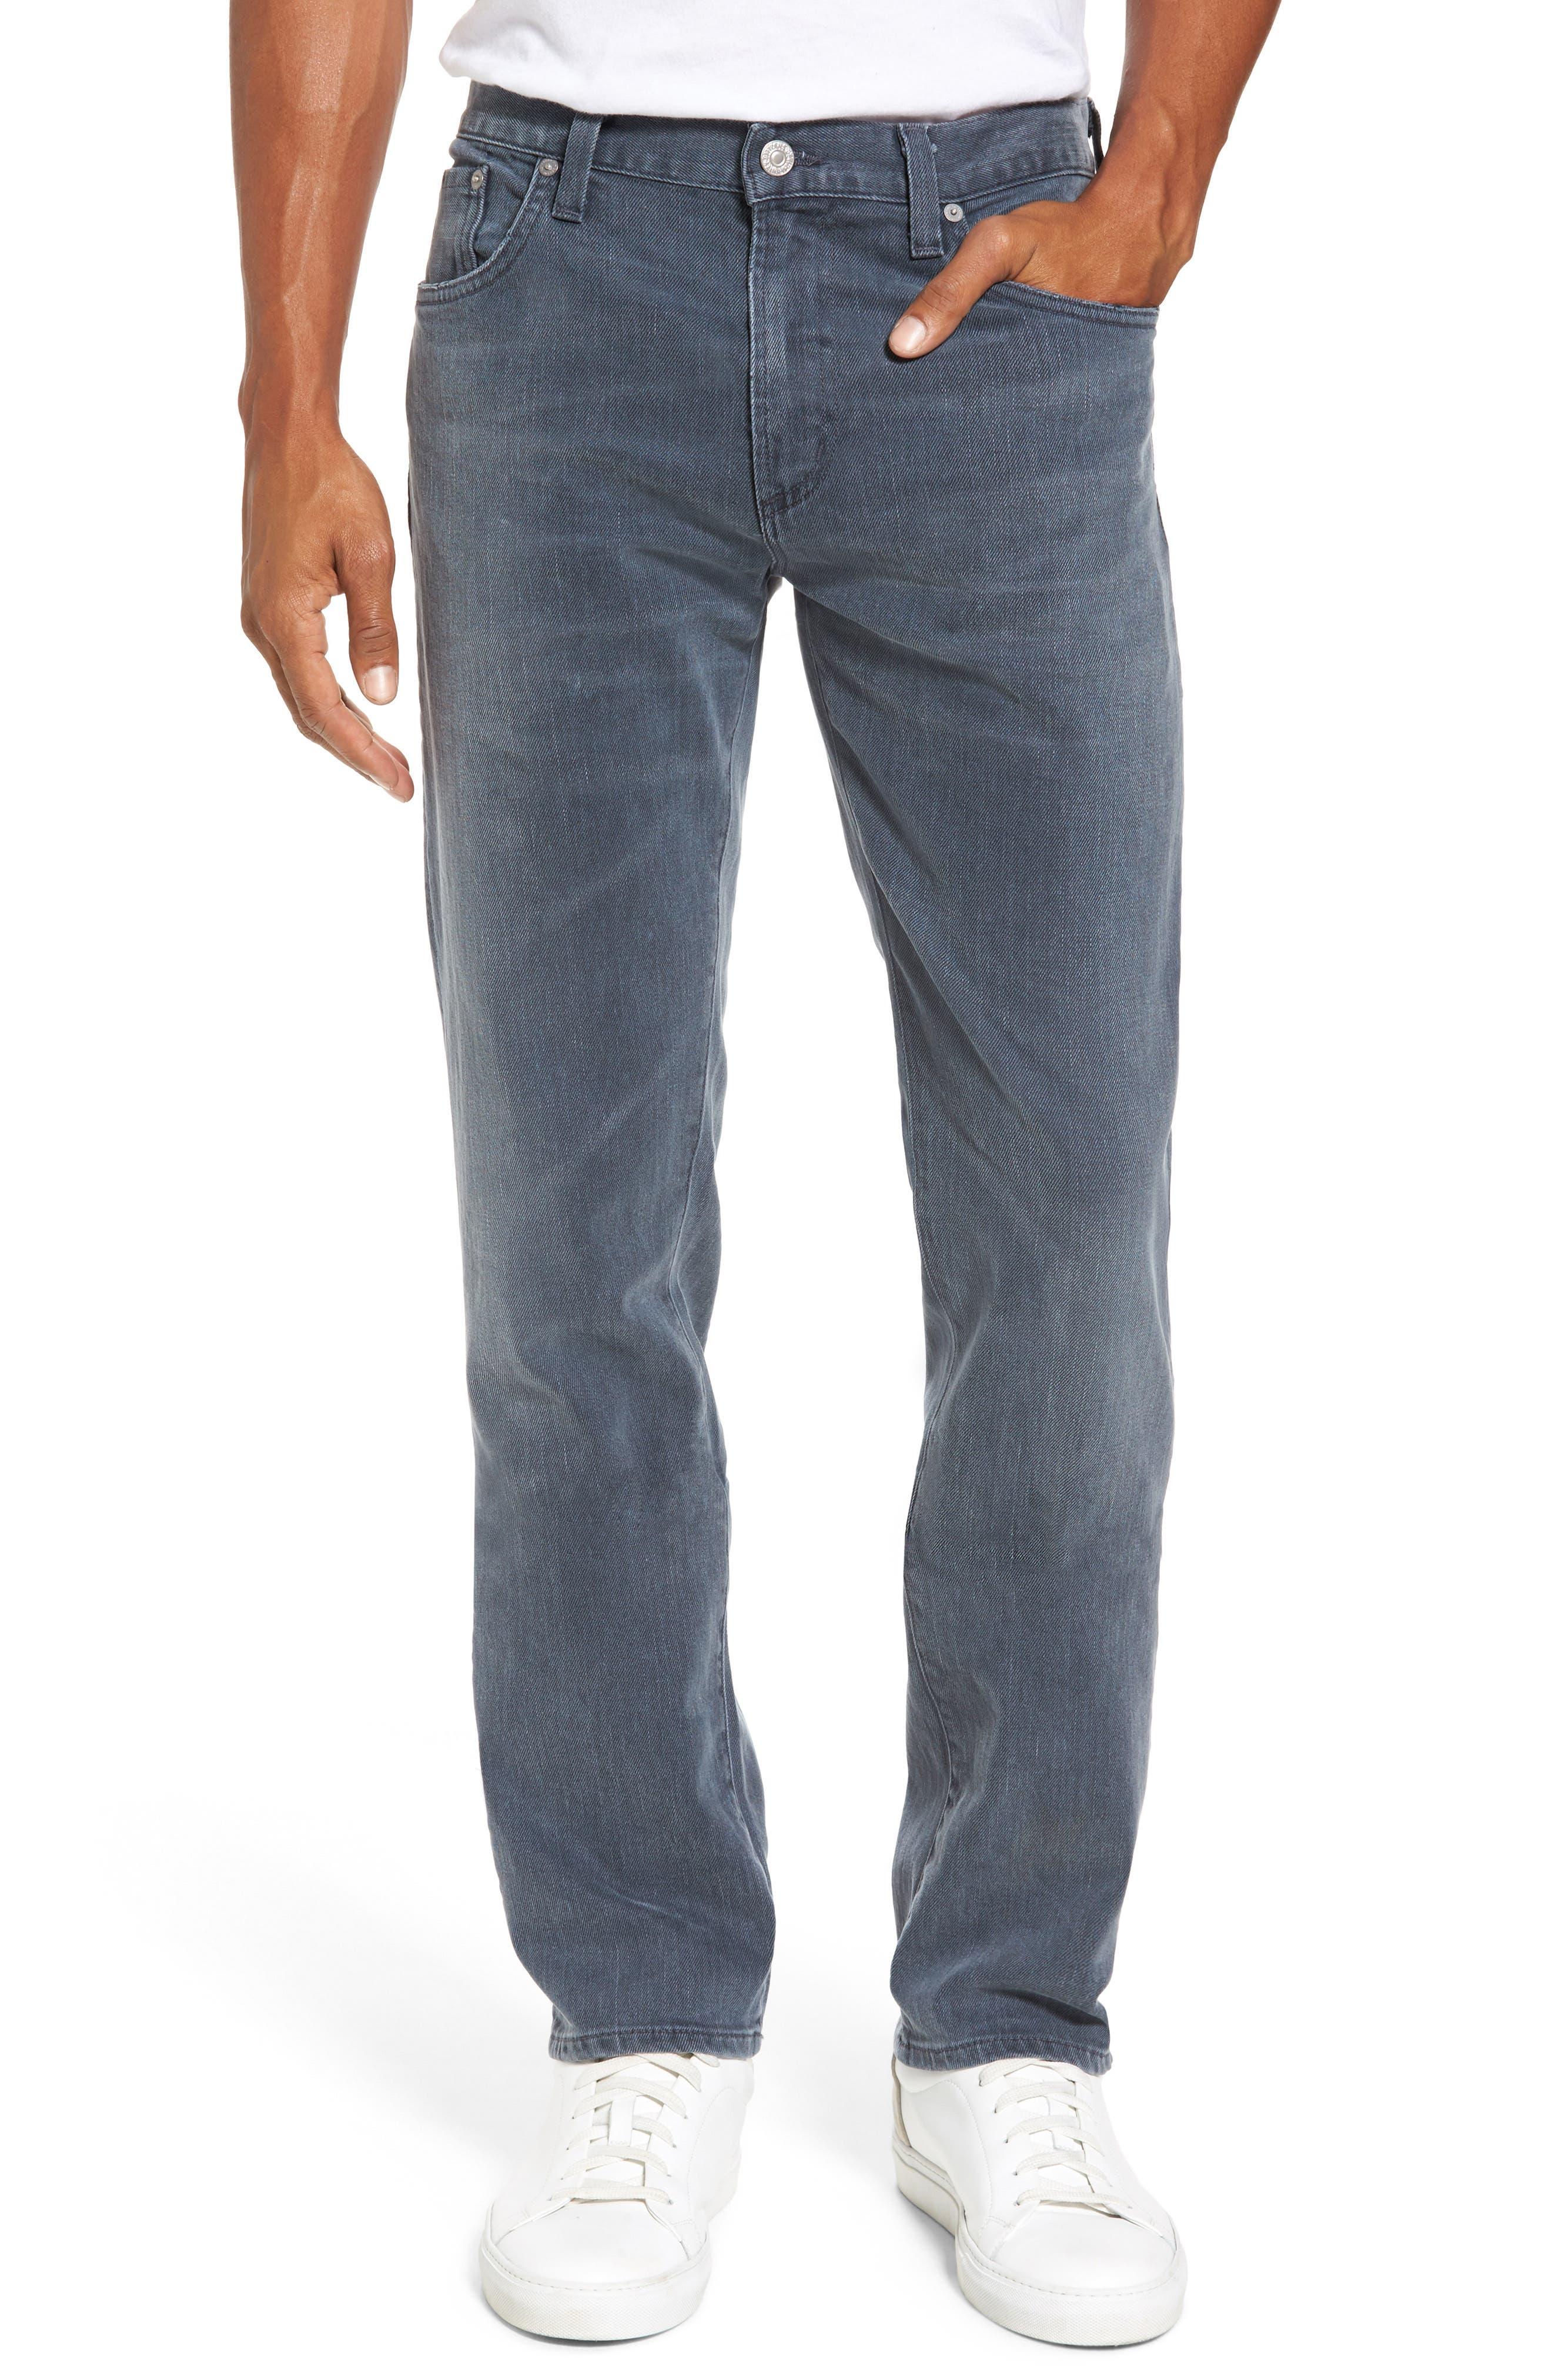 Core Slim Fit Jeans,                         Main,                         color, Grey Skies